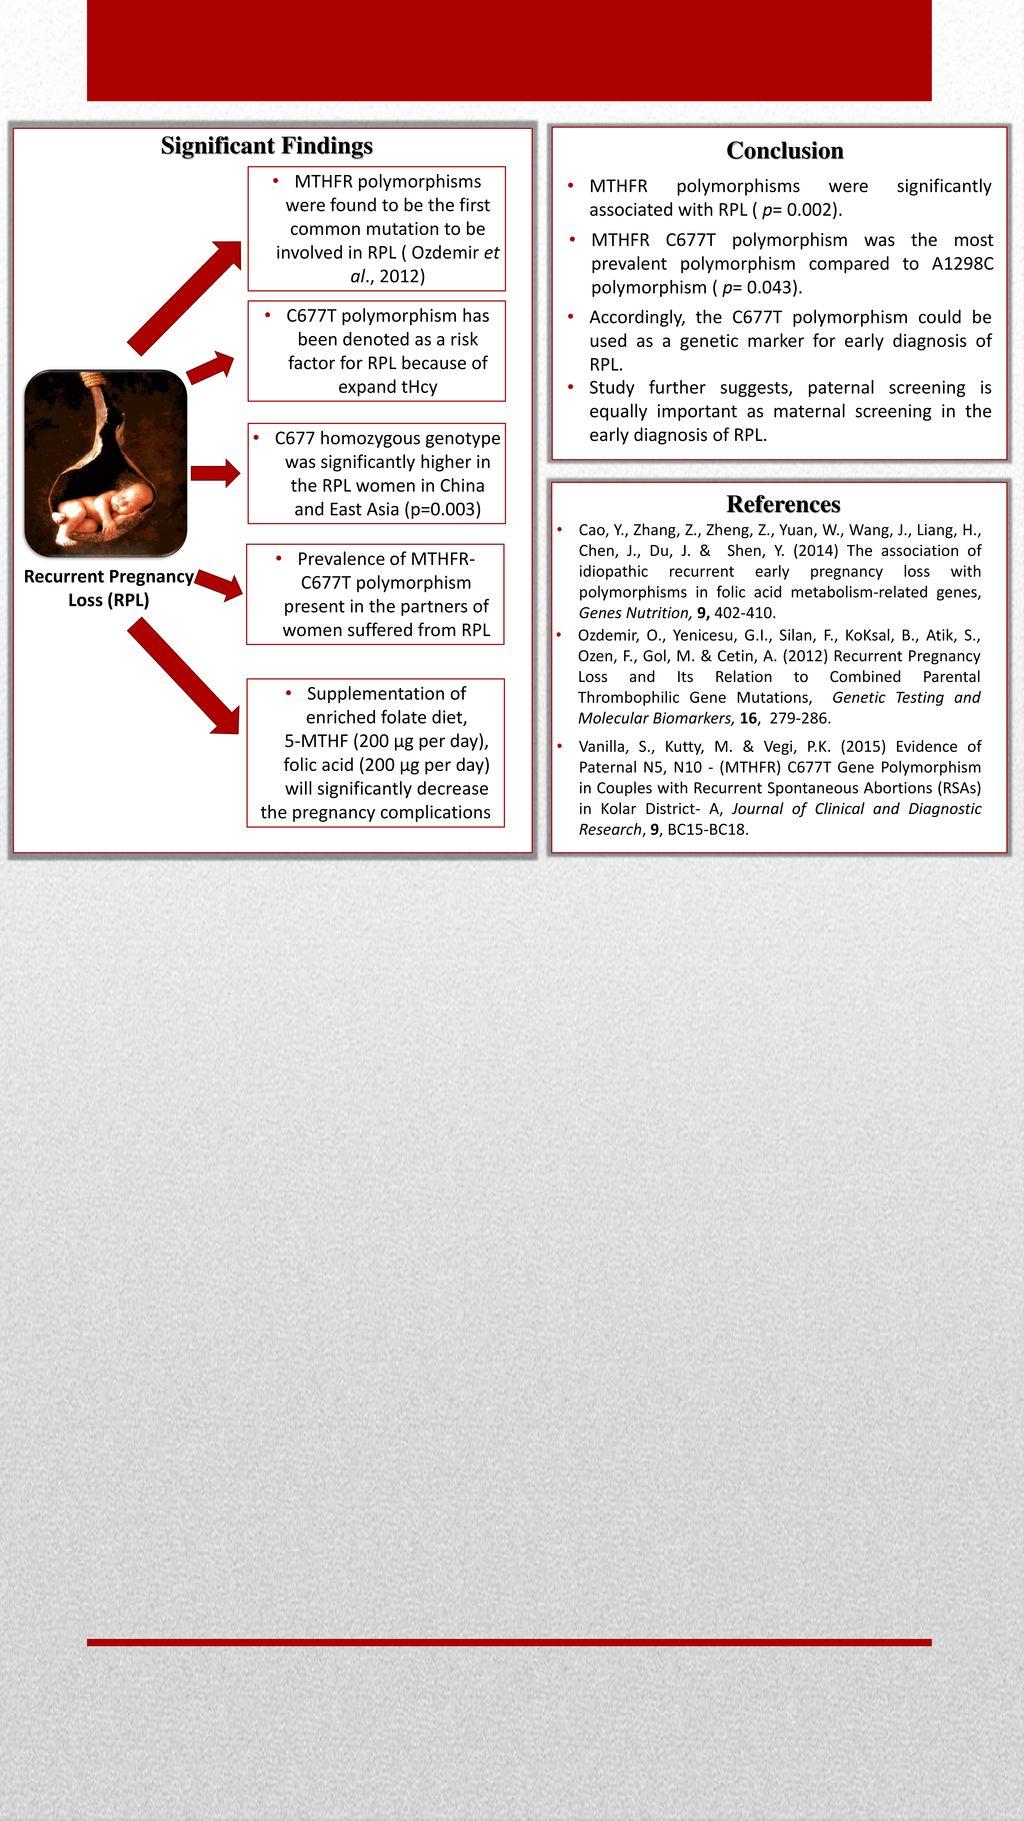 Analysis of Methylenetetrahydrofolatereductase (MTHFR) Polymorphisms